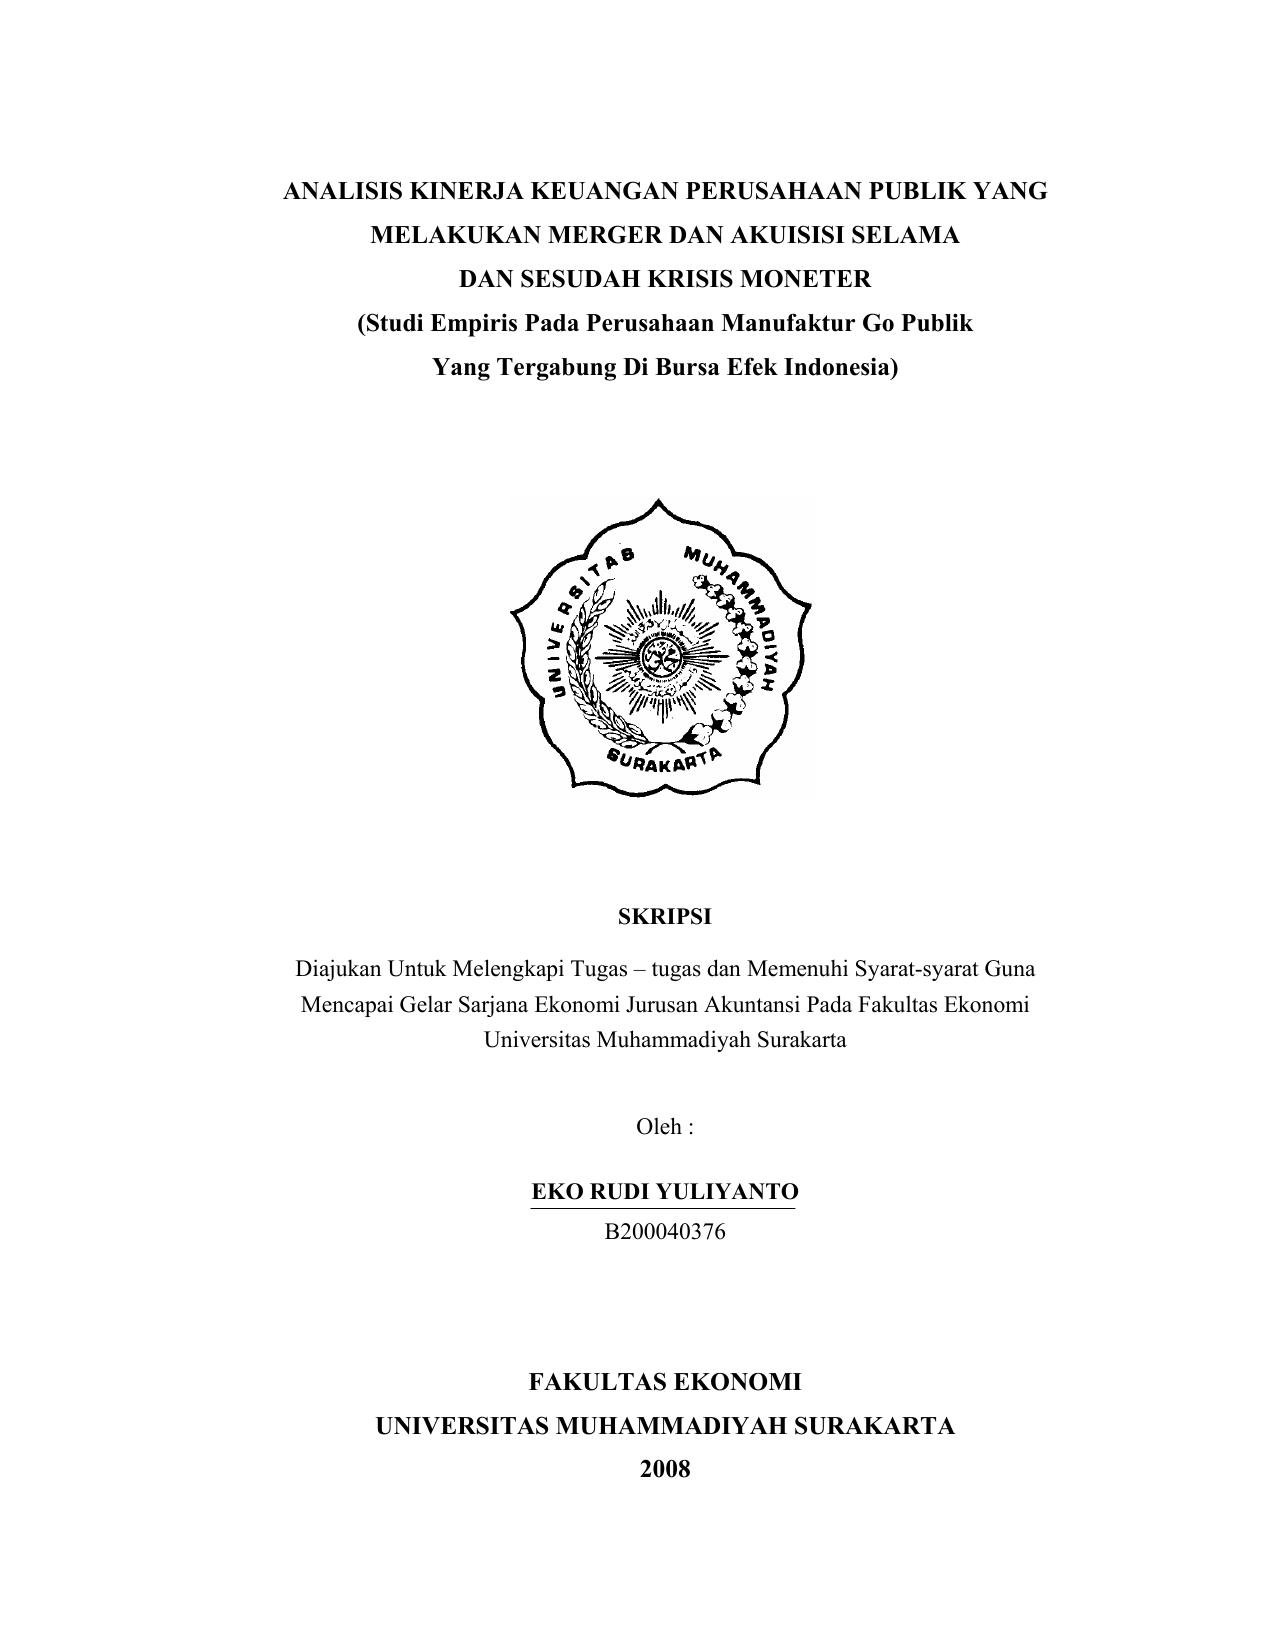 Analisis Kinerja Keuangan Perusahaan Publik Yang